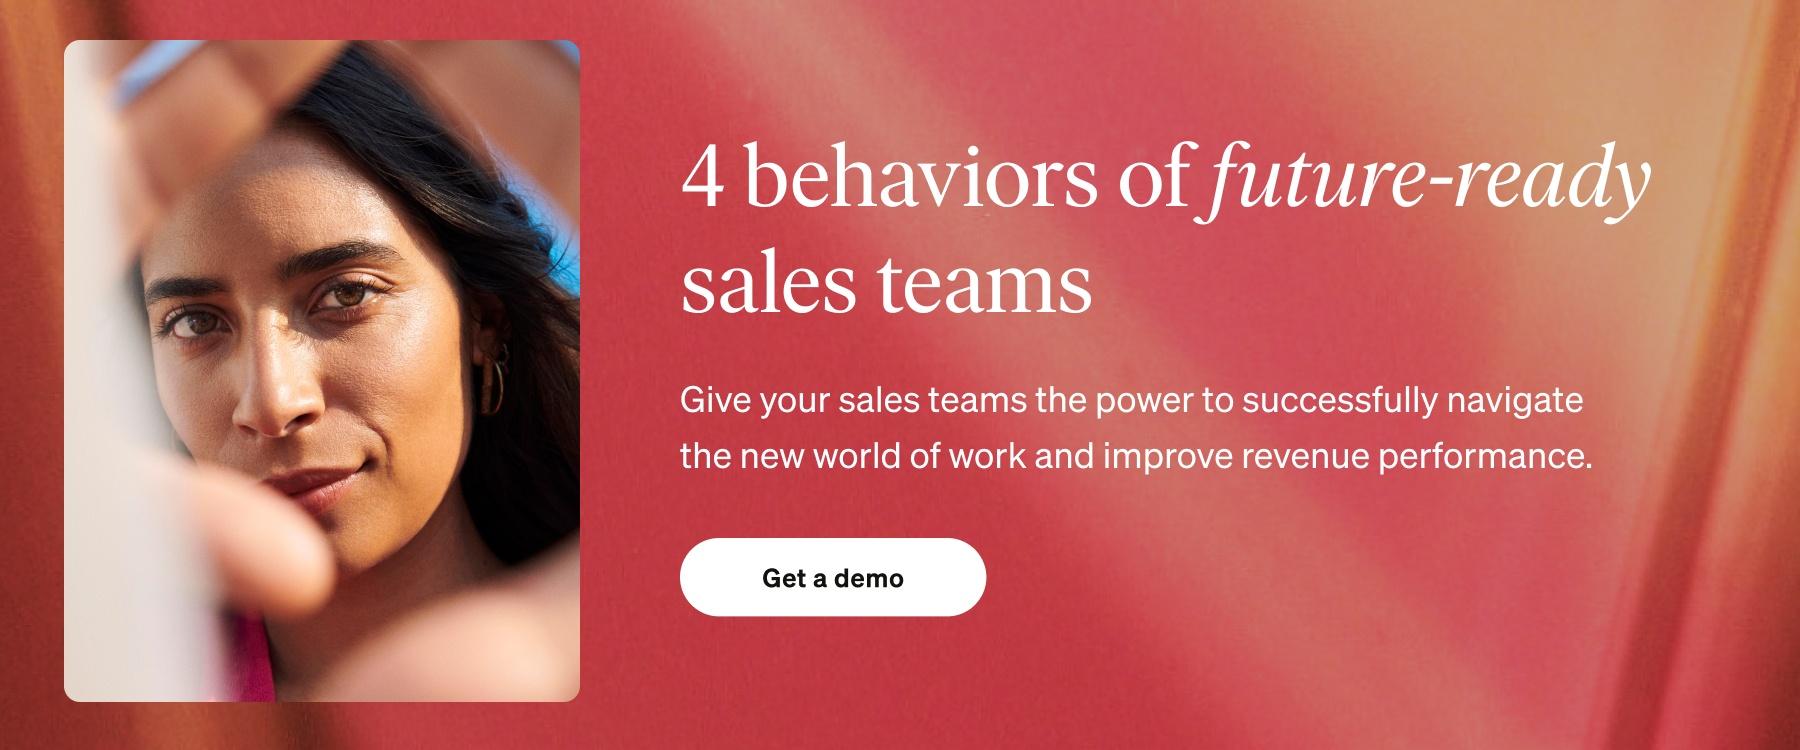 future-sales-team-cta